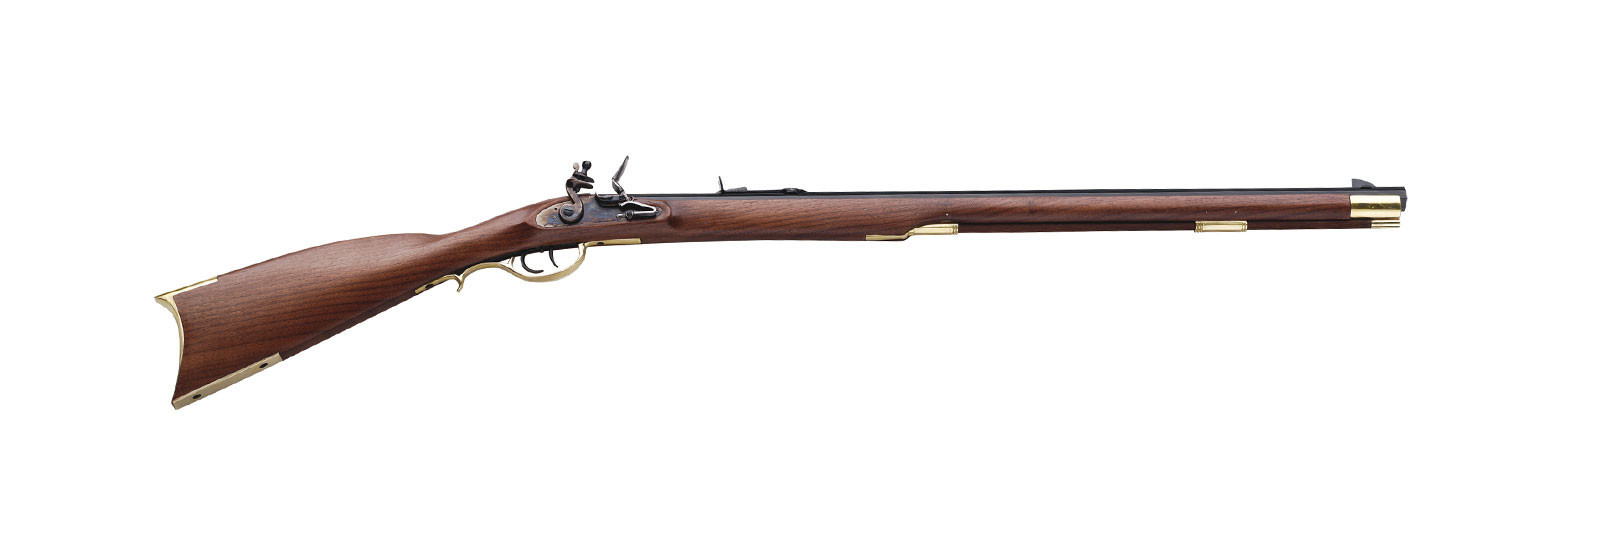 Scout rifle flint.st.cal. 50